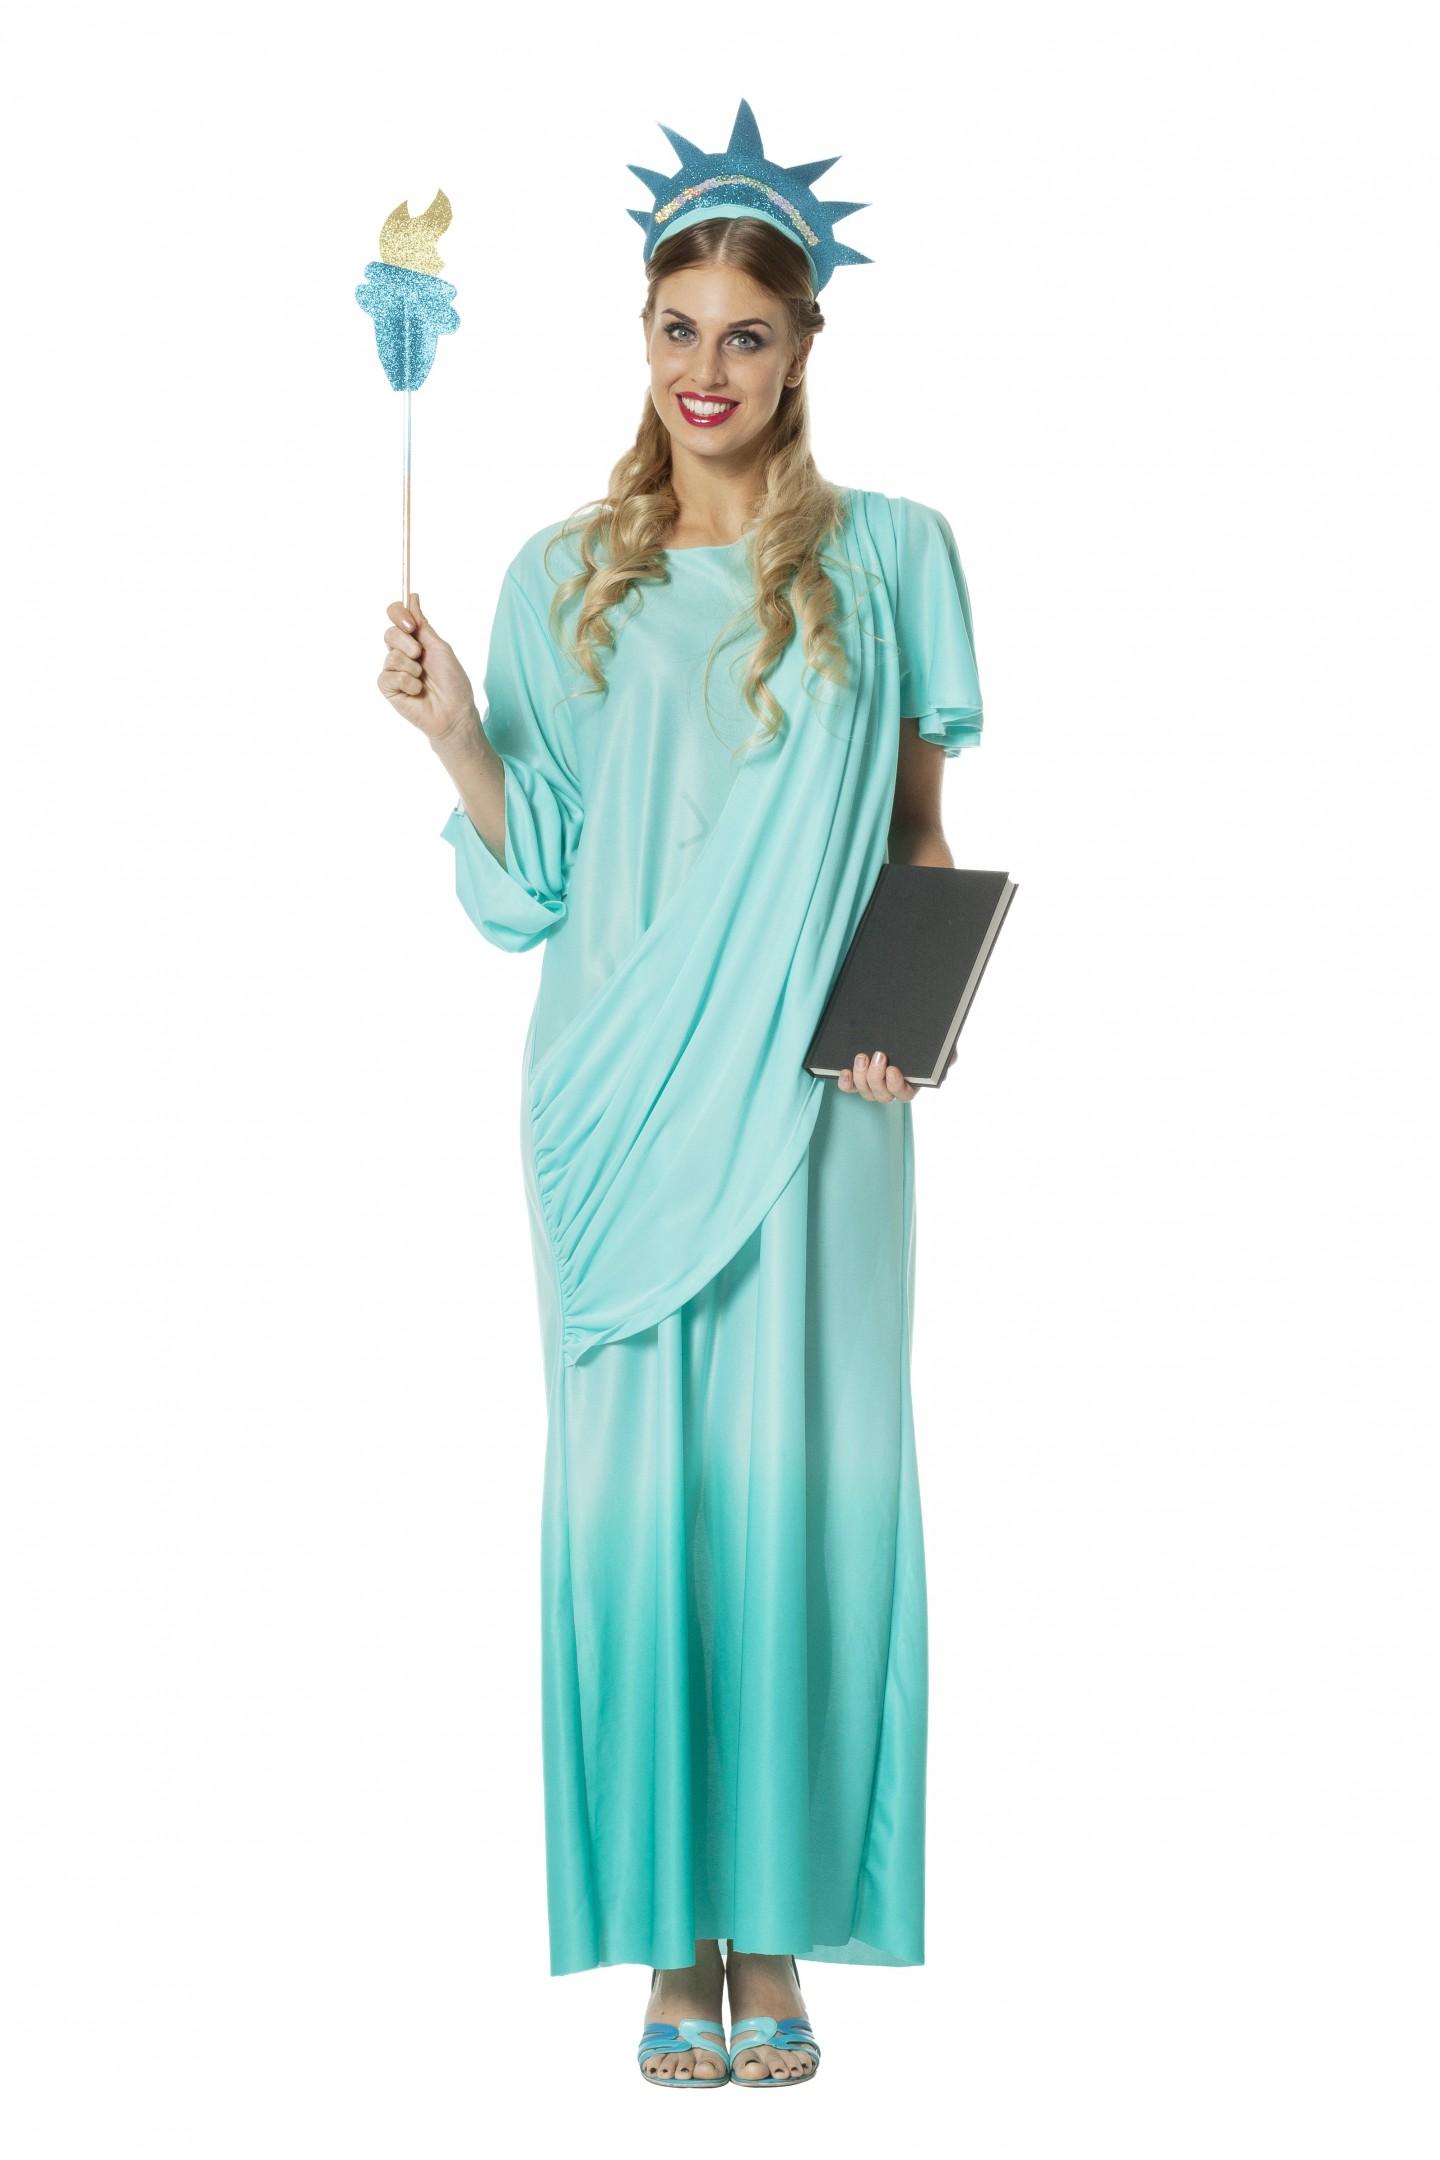 Liberty lady vrijheidsbeeld-0